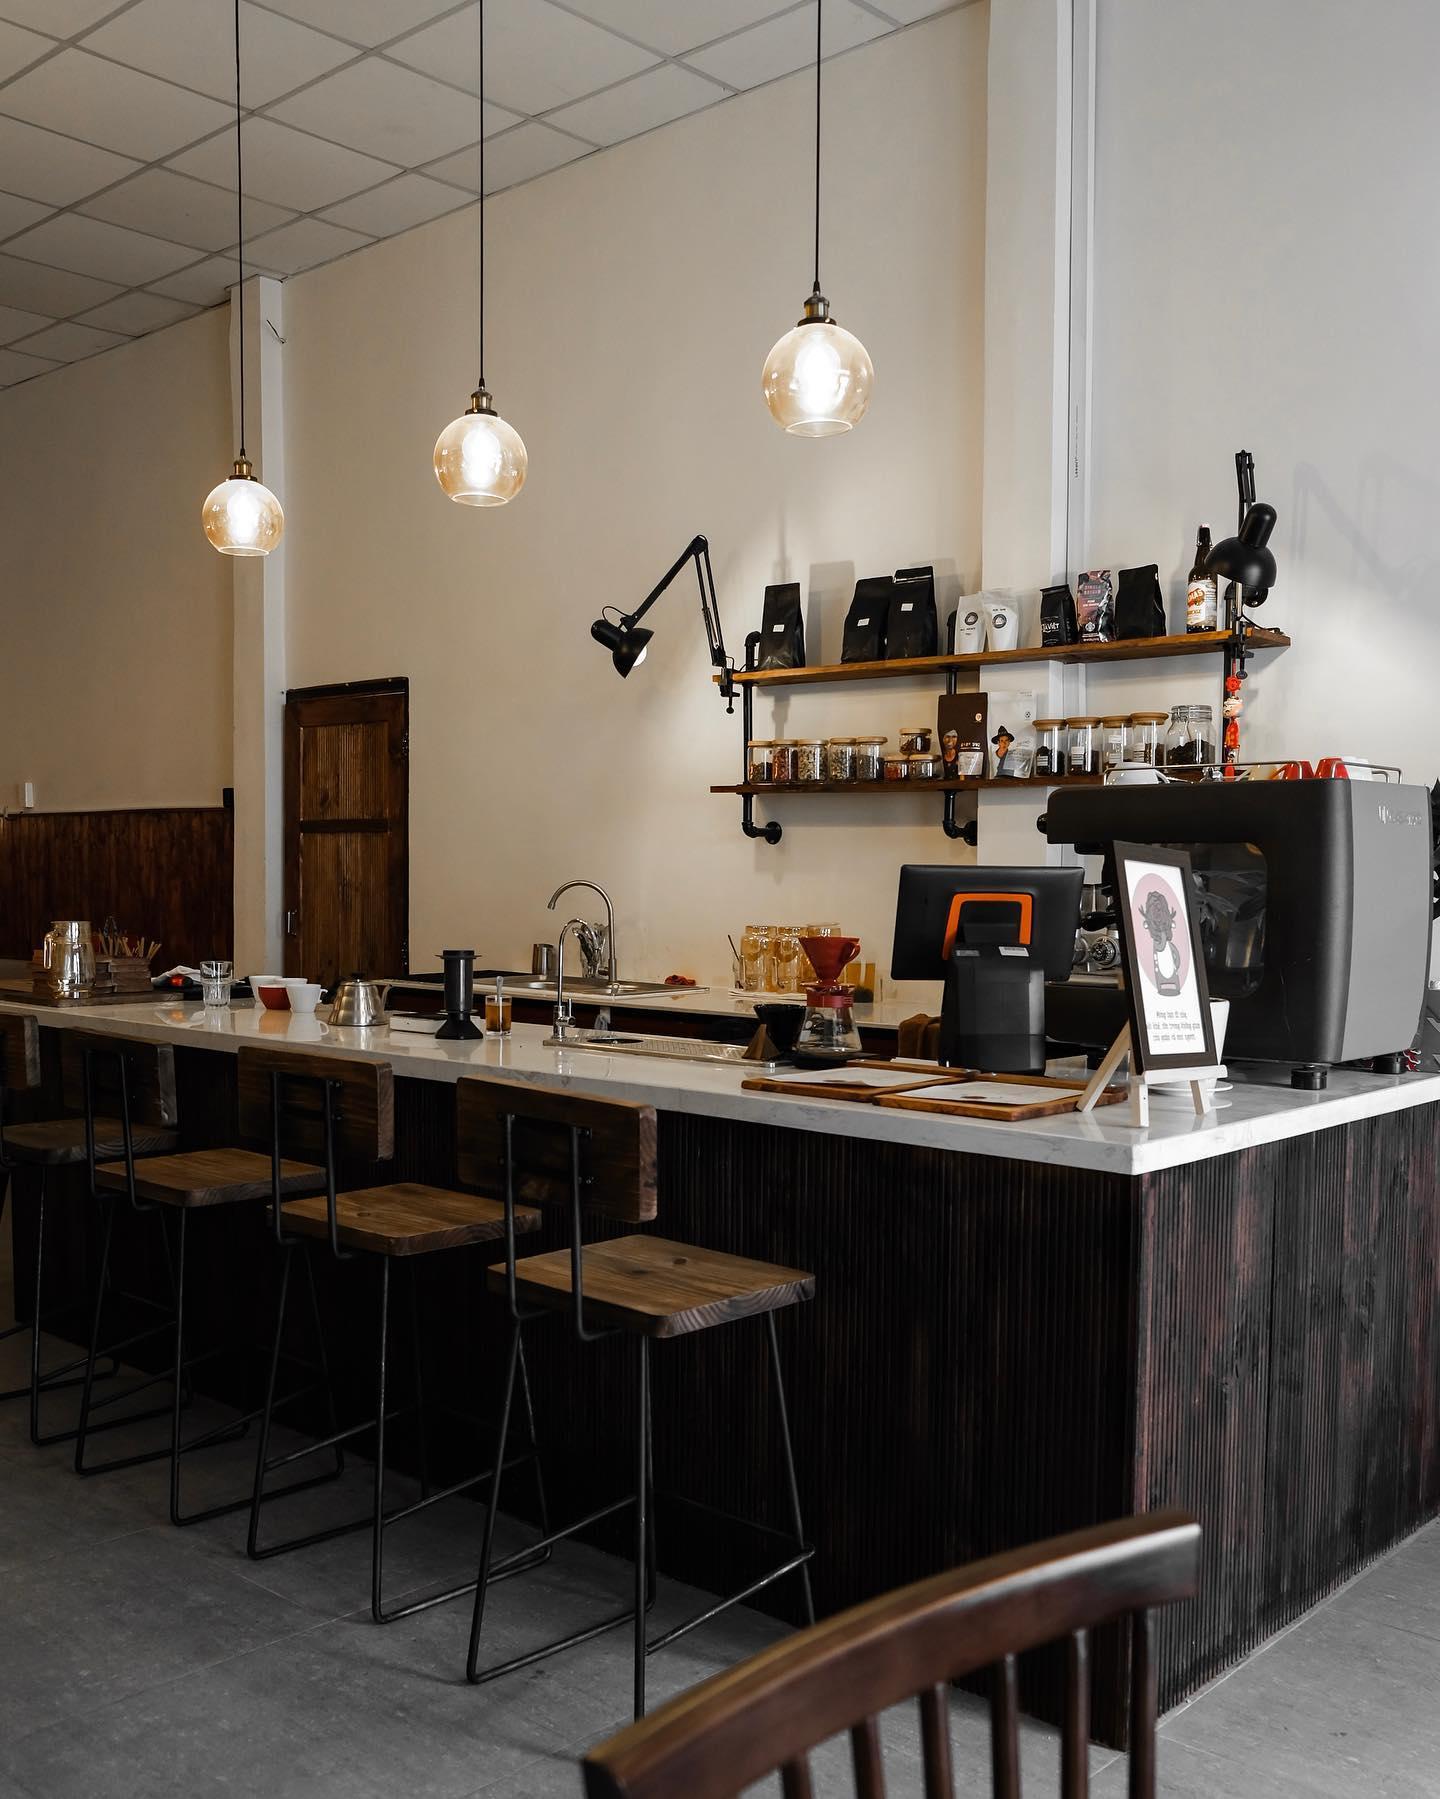 sai-gon-cafe-dep-tai-sai-gon-rosaria-book-coffee-5